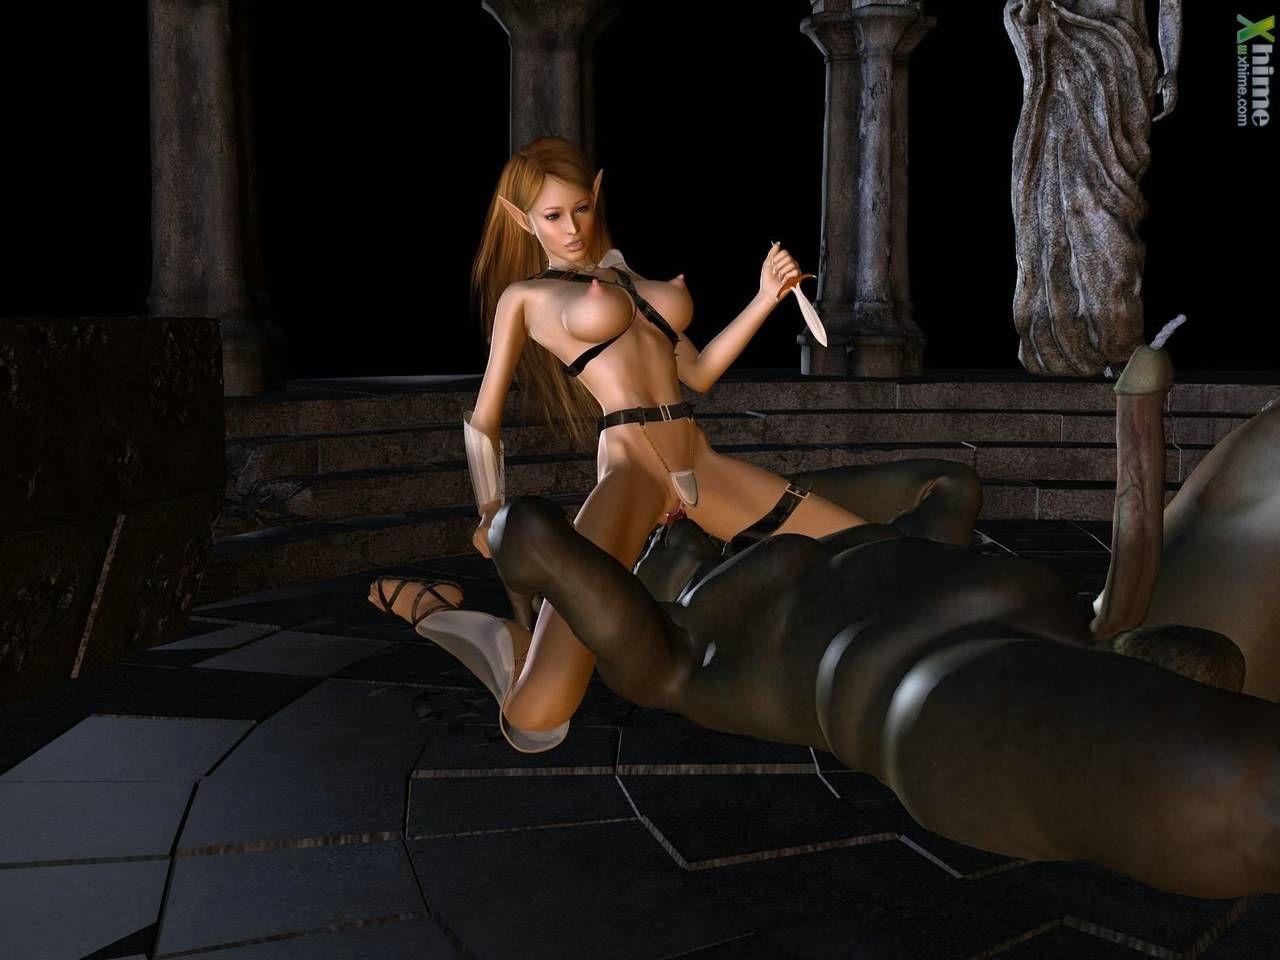 fantasy cg collection - part 8